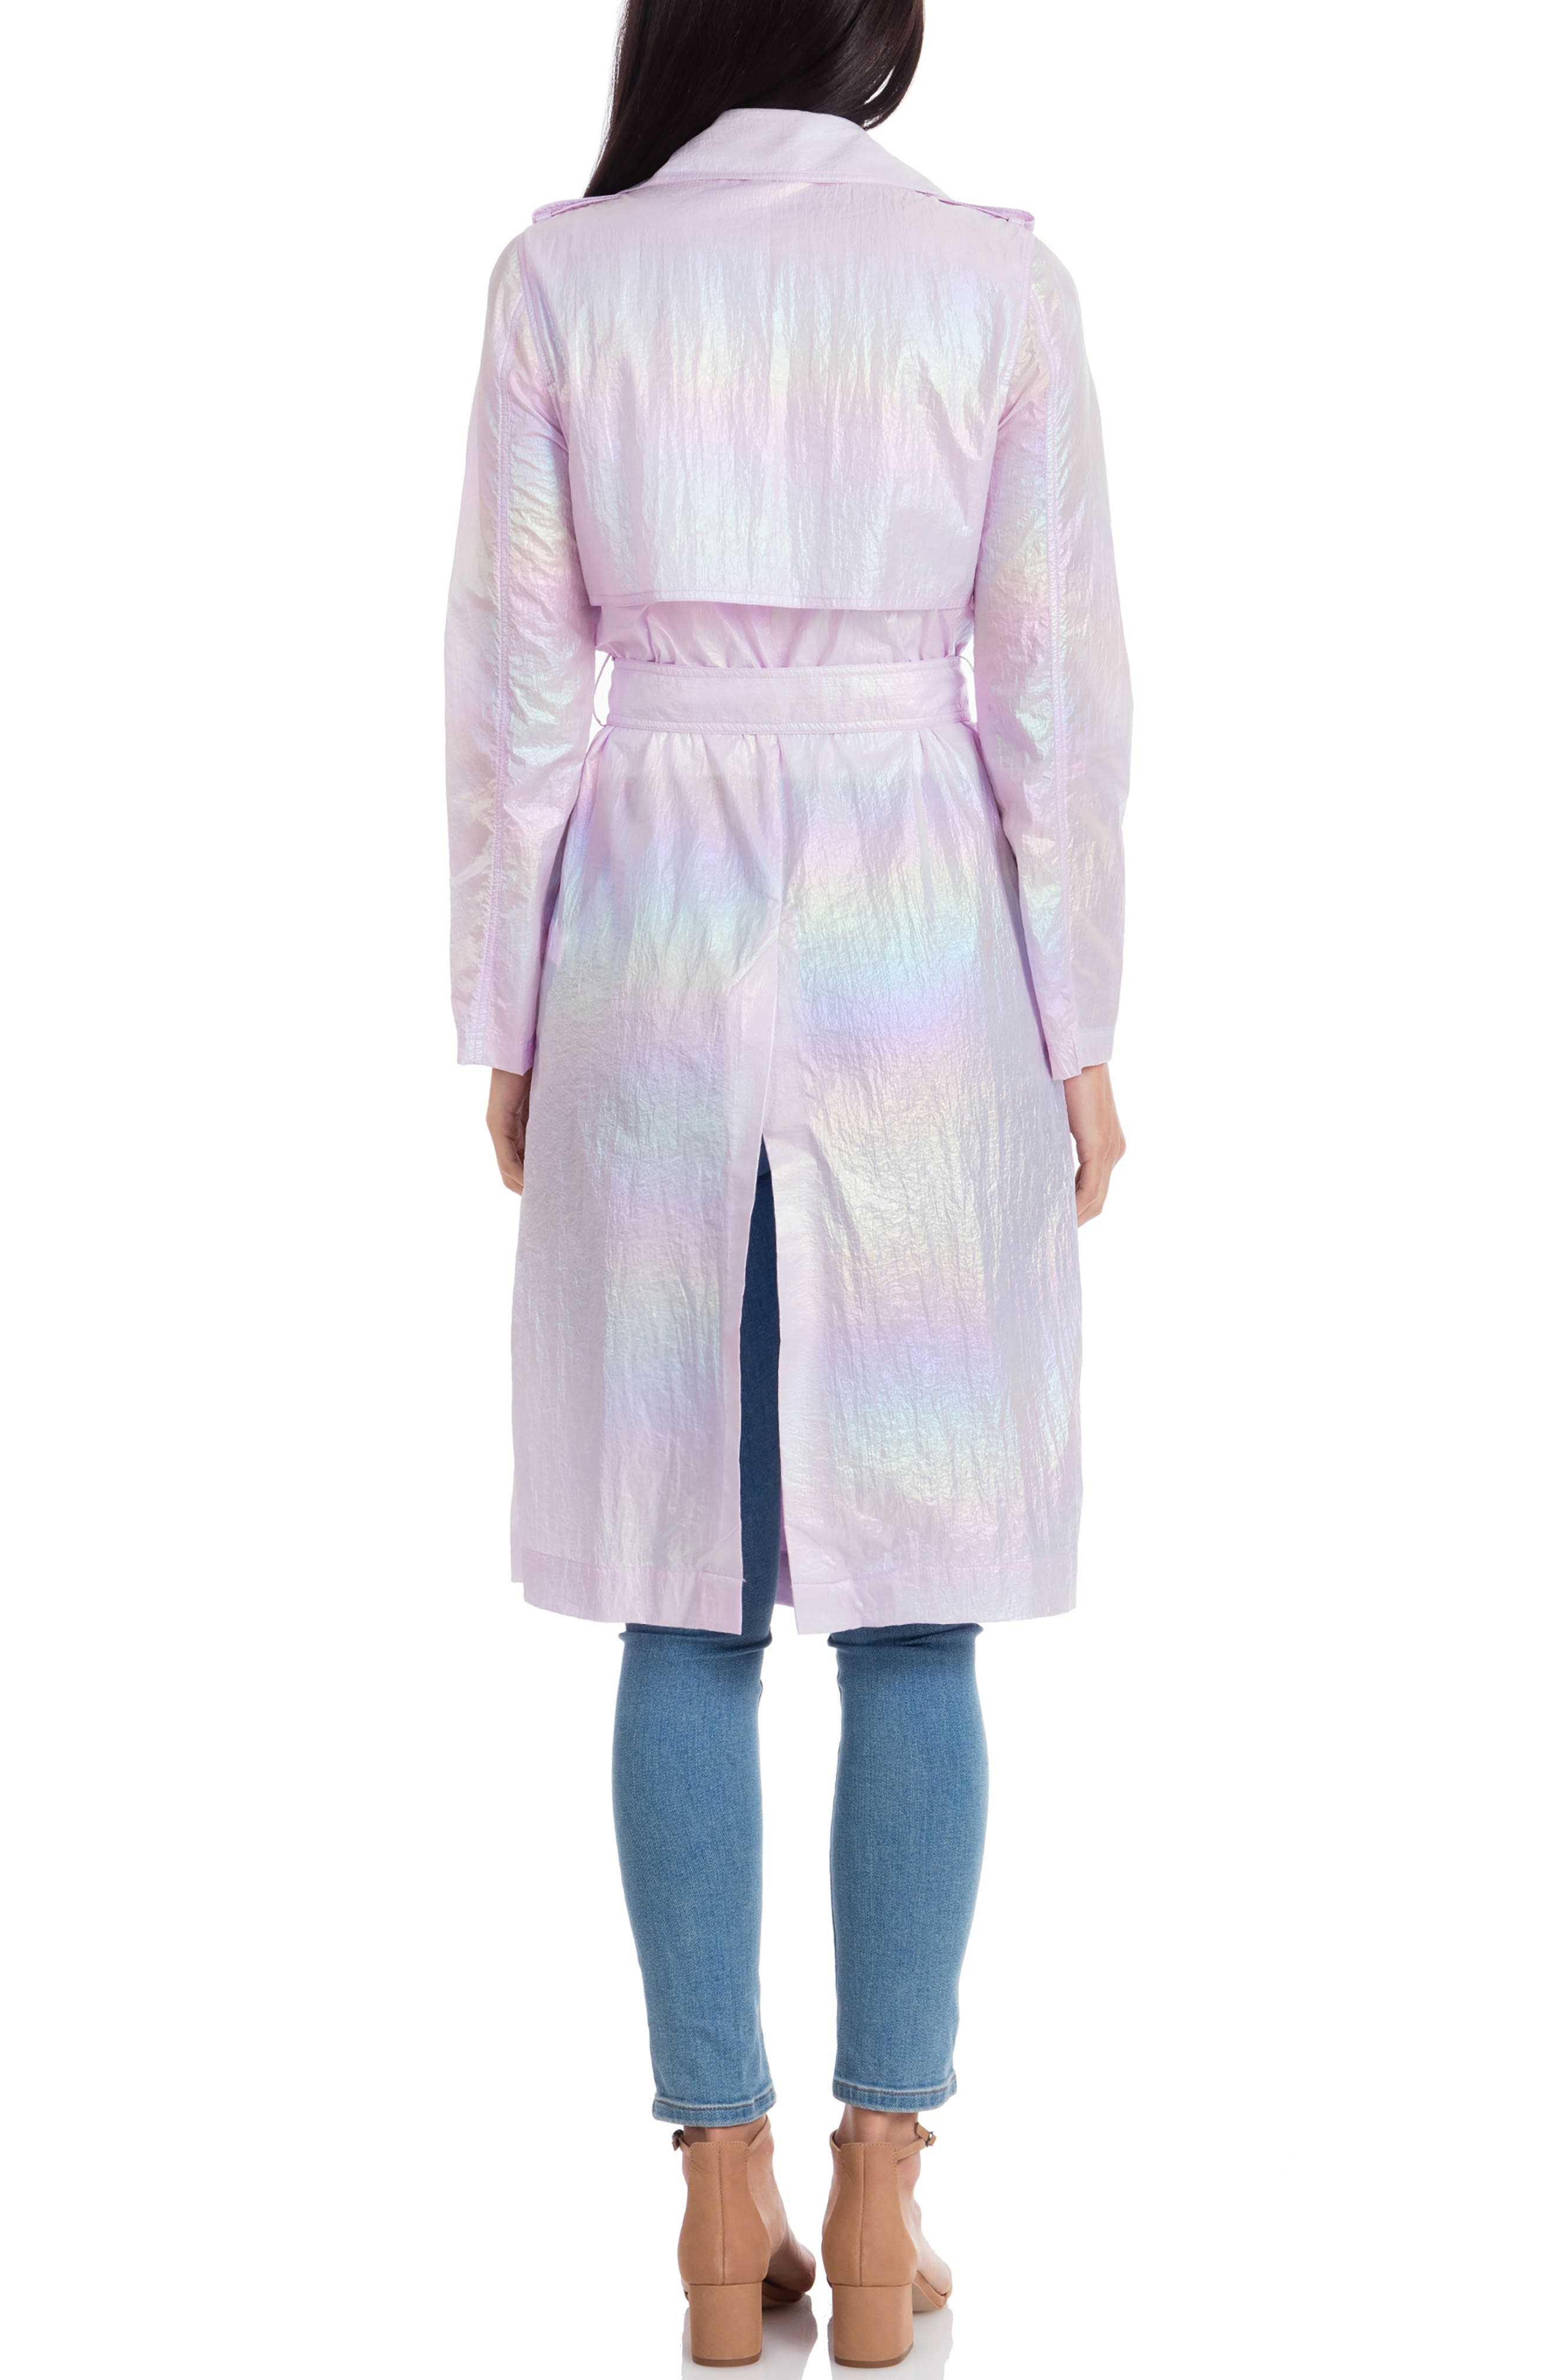 AVEC LES FILLES, Iridescent Trench Coat, Alternate thumbnail 2, color, IRIDESCENT